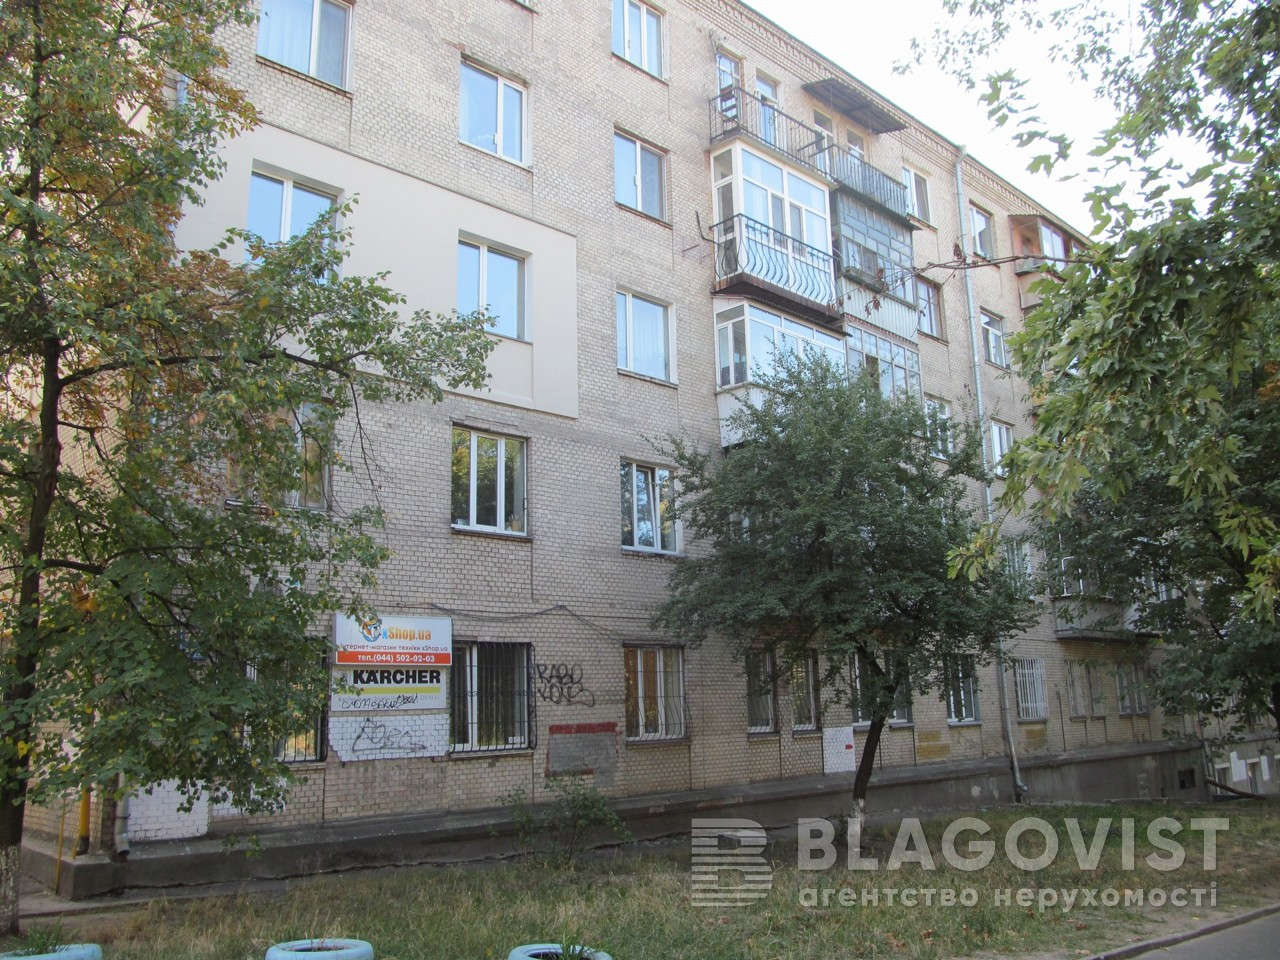 Квартира C-109882, Дружбы Народов бульв., 10, Киев - Фото 3